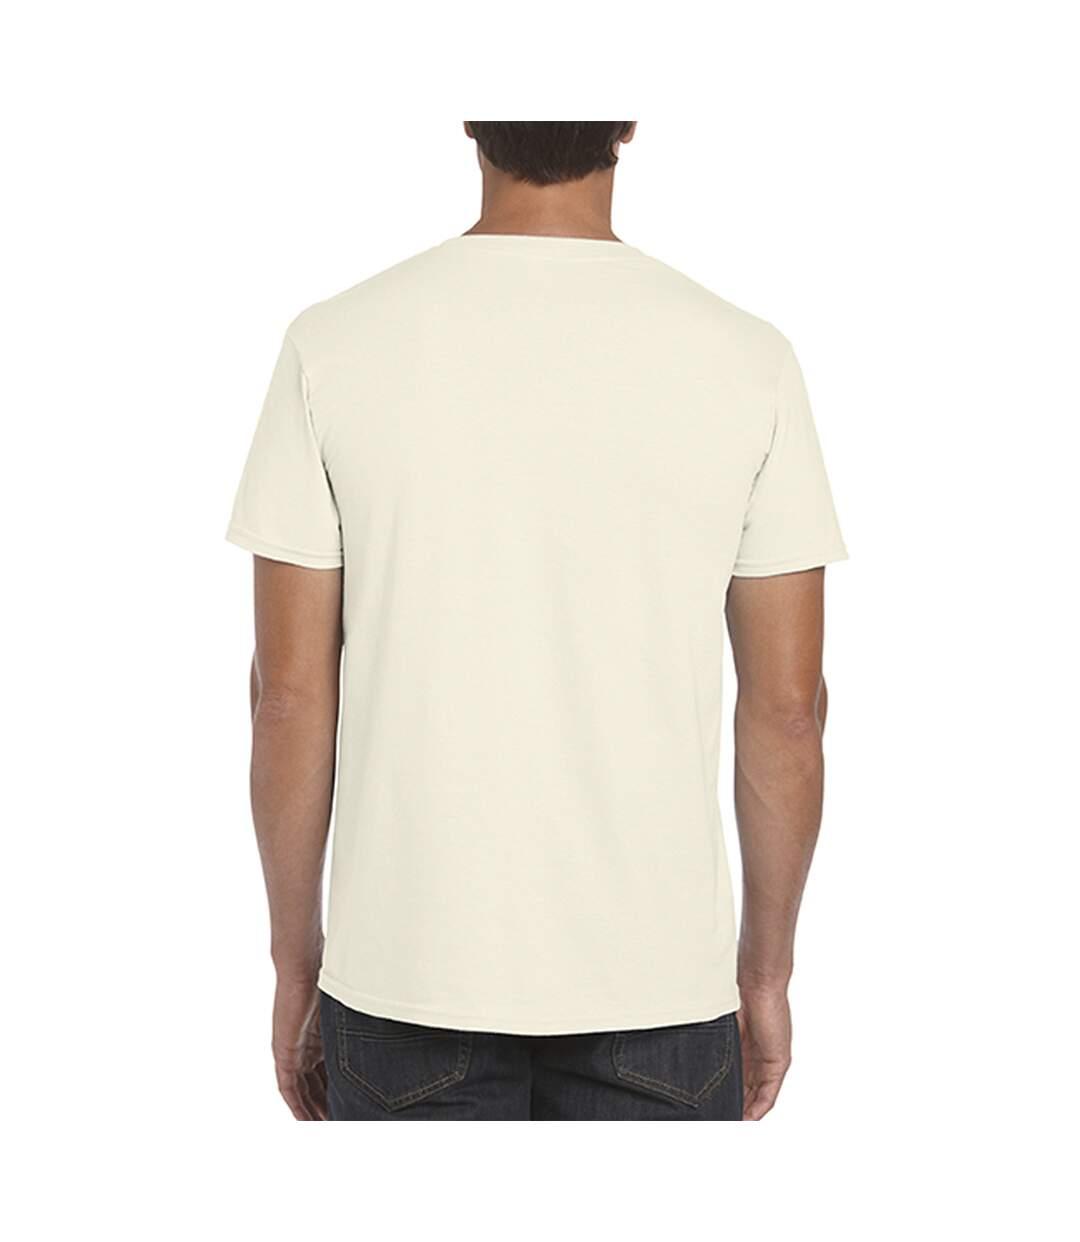 Gildan Mens Short Sleeve Soft-Style T-Shirt (Military Green) - UTBC484